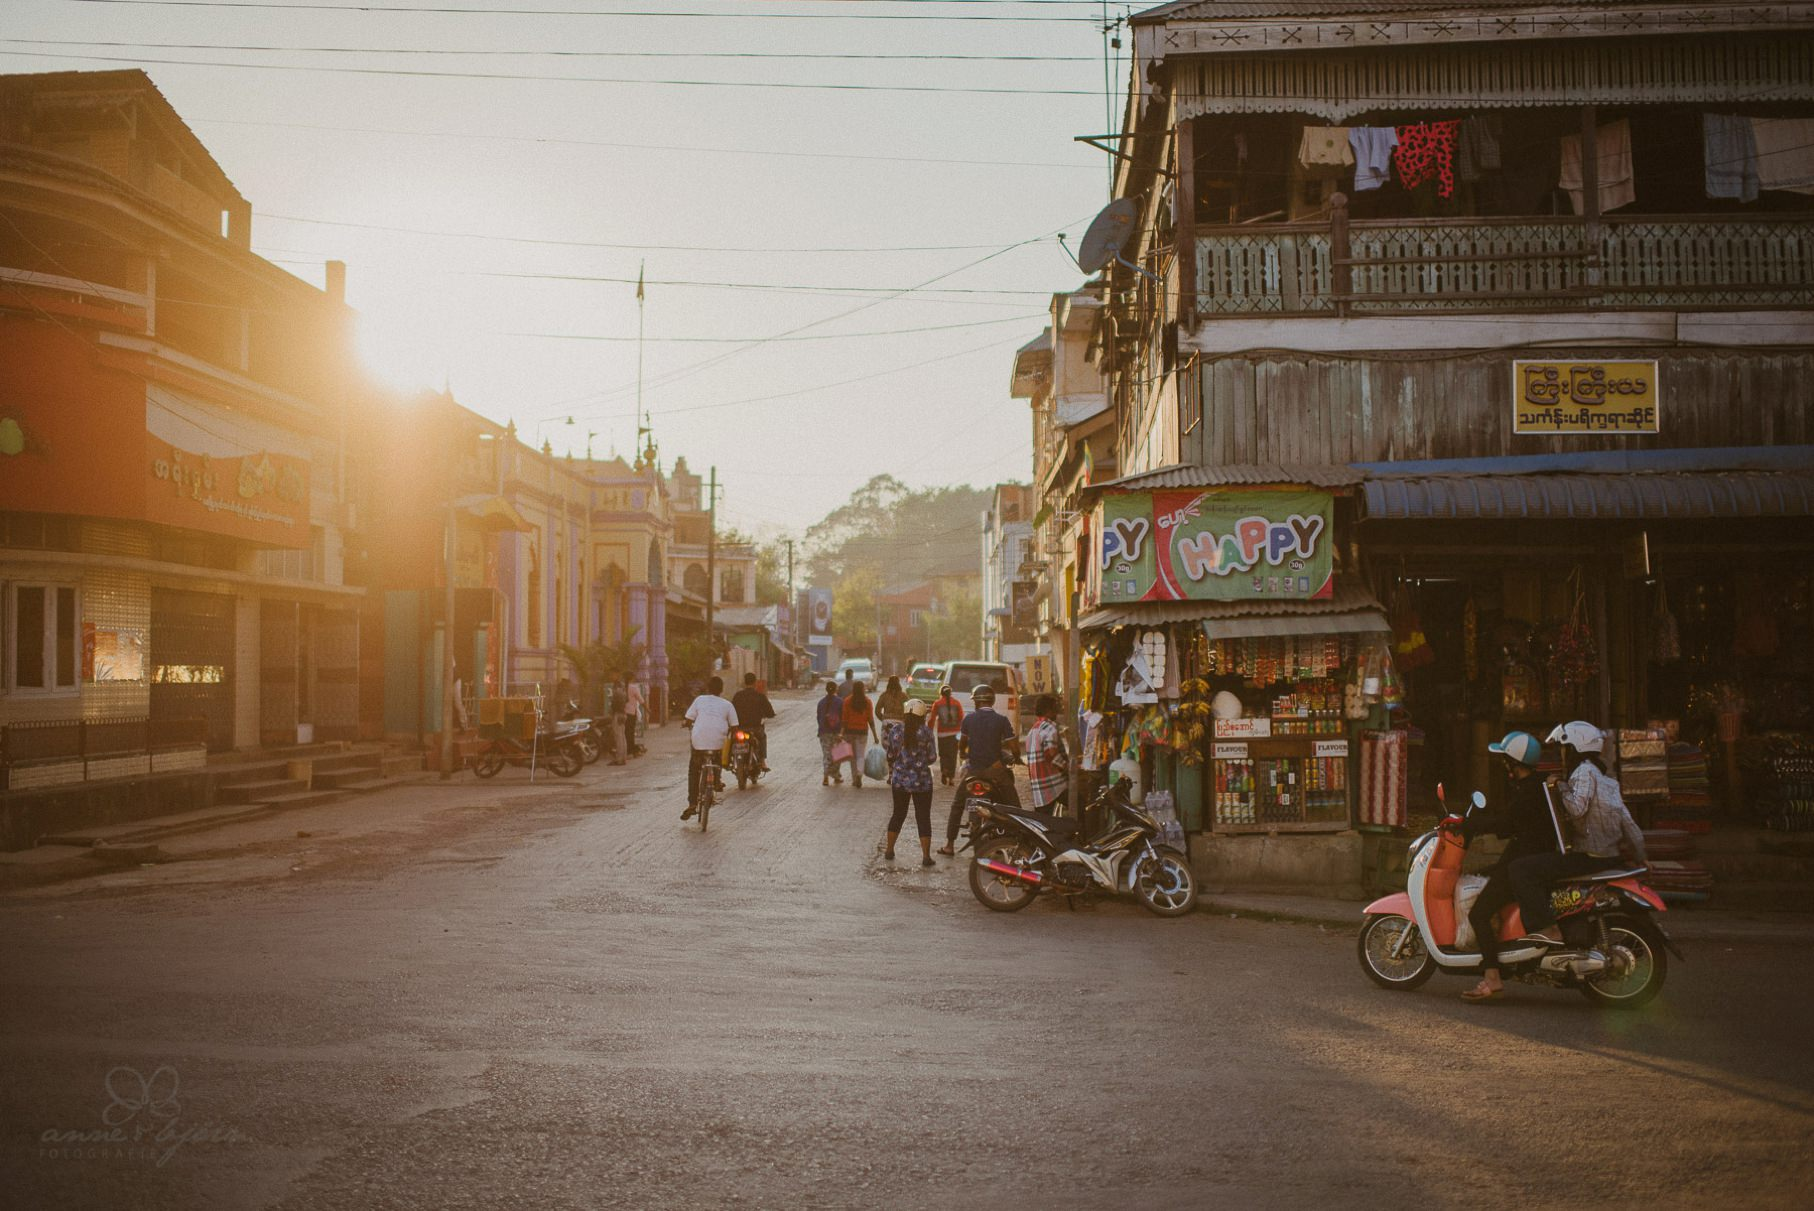 0071 yangon mandalay d76 7251 - Großstädte Myanmars - Yangon & Mandalay